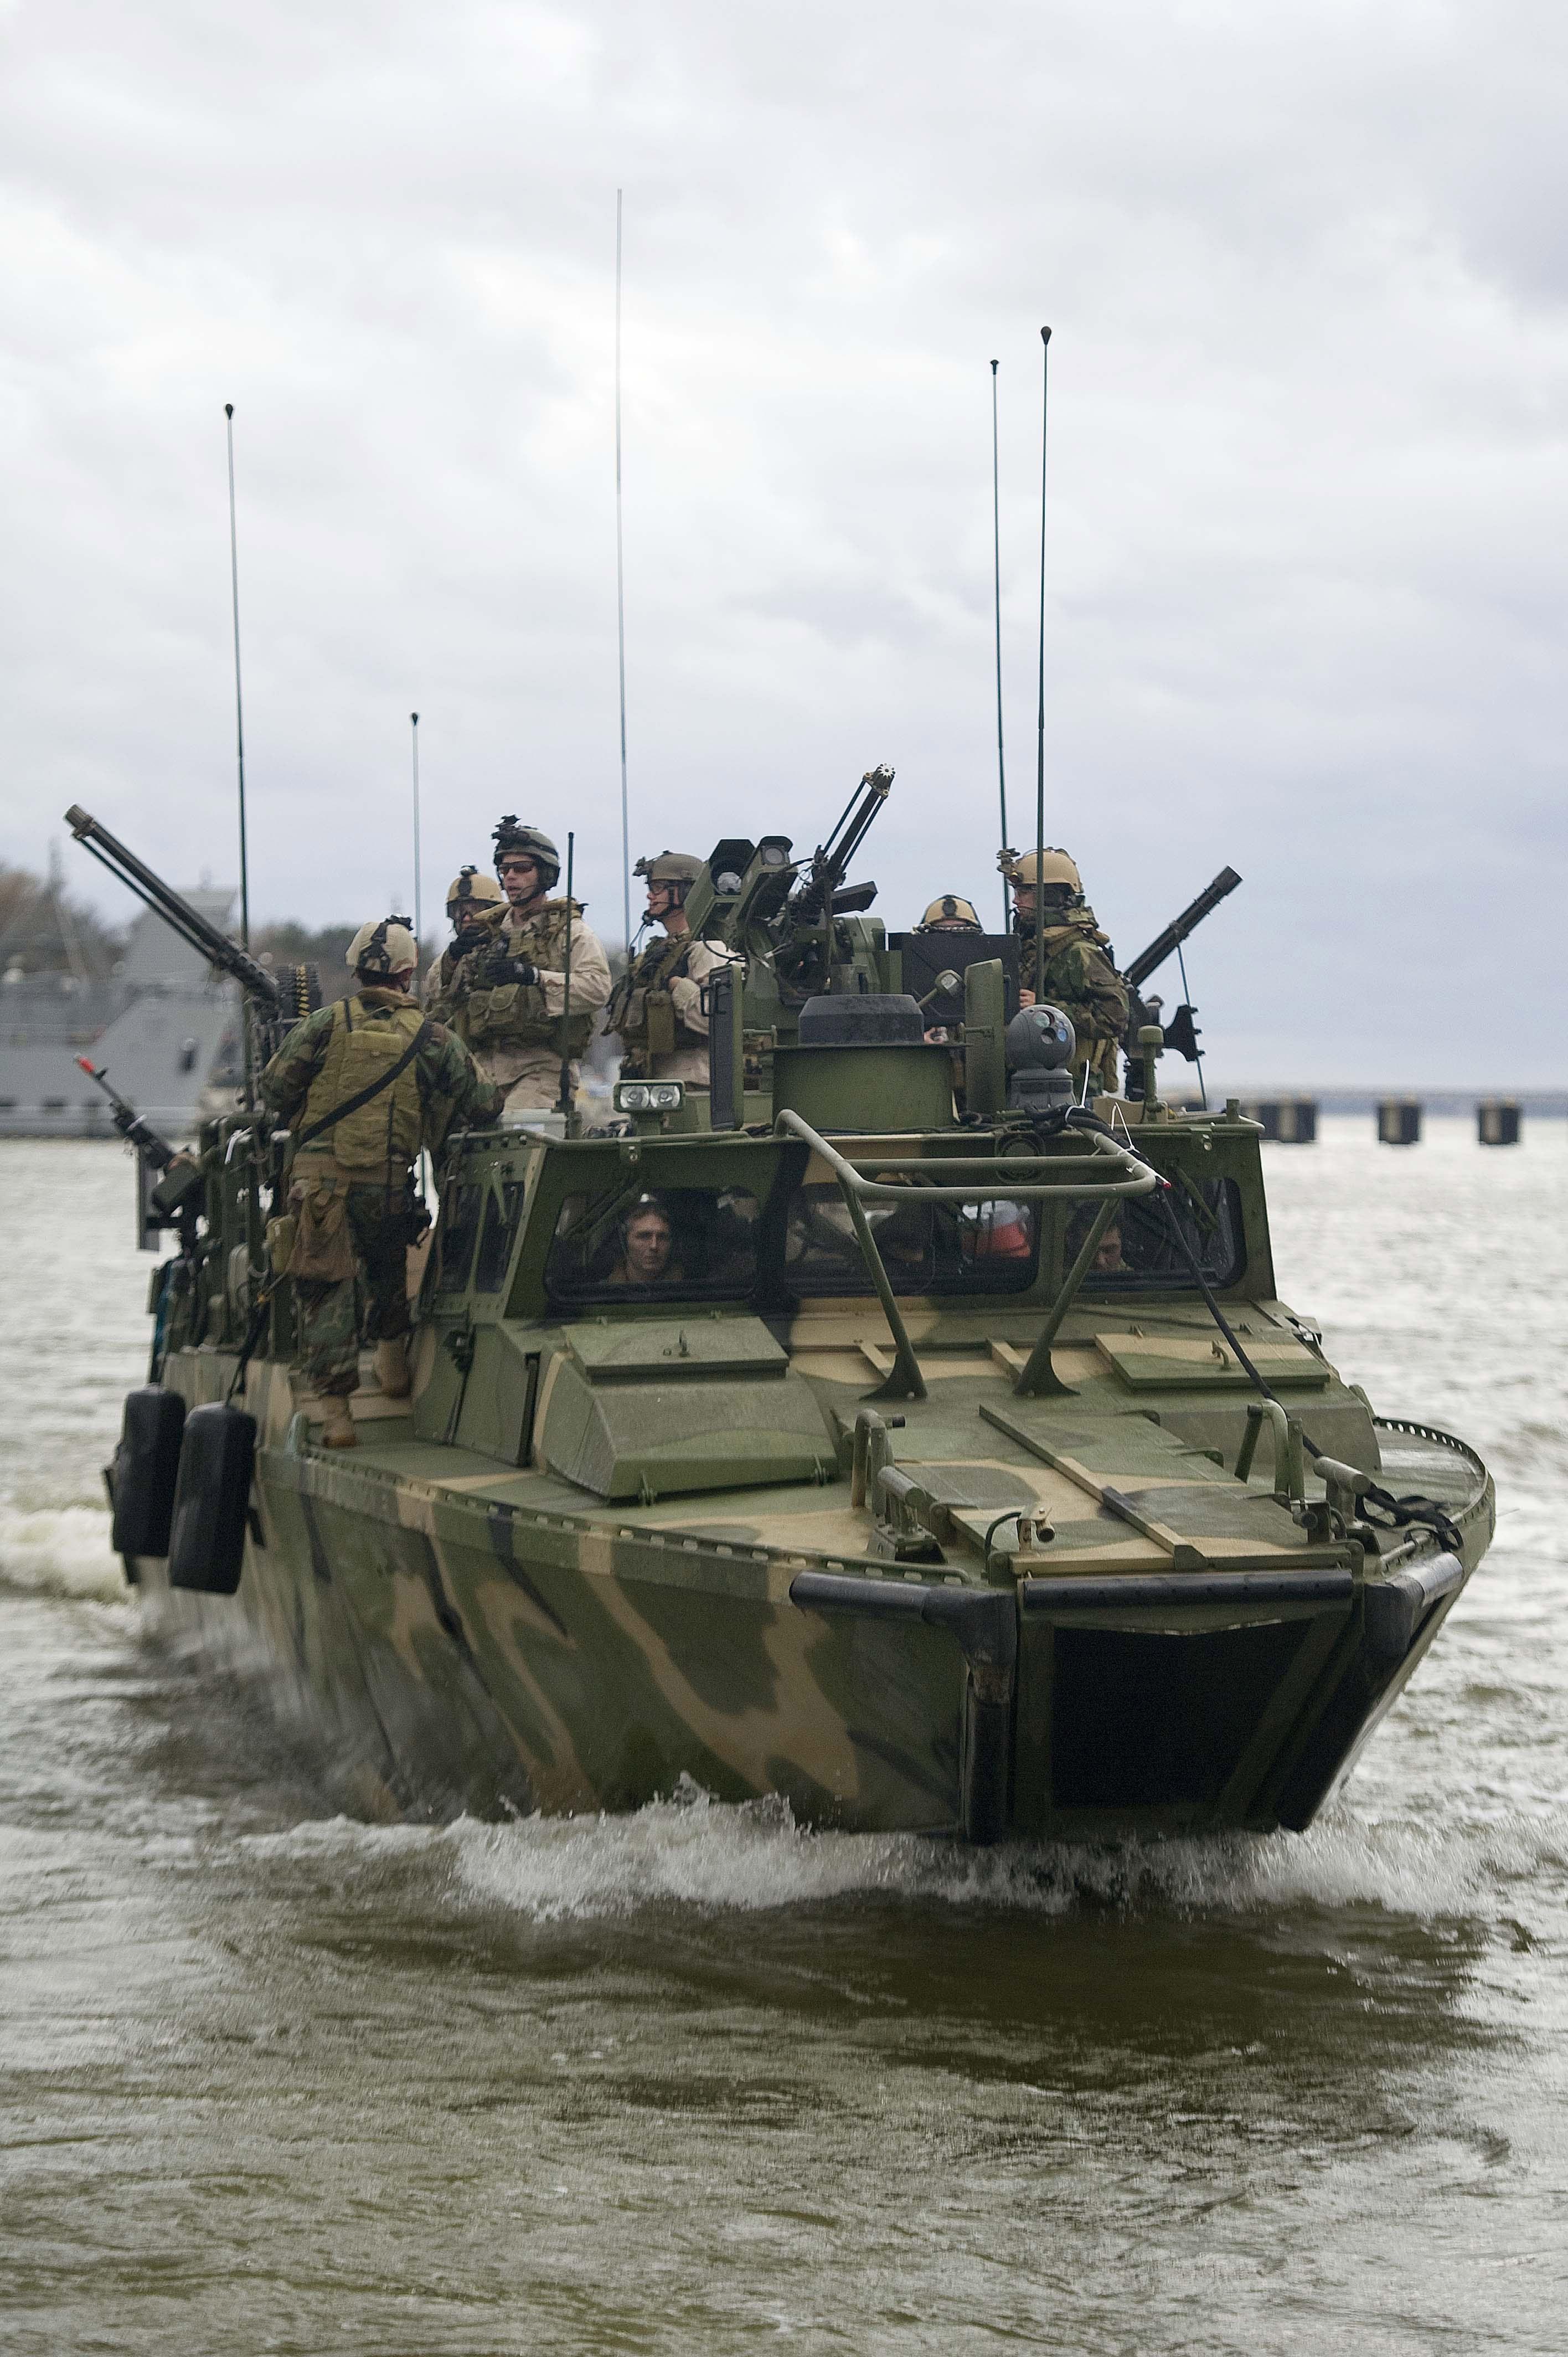 File:Defense.gov News Photo 111207-N-PC102-143 - U.S. Marines with ...